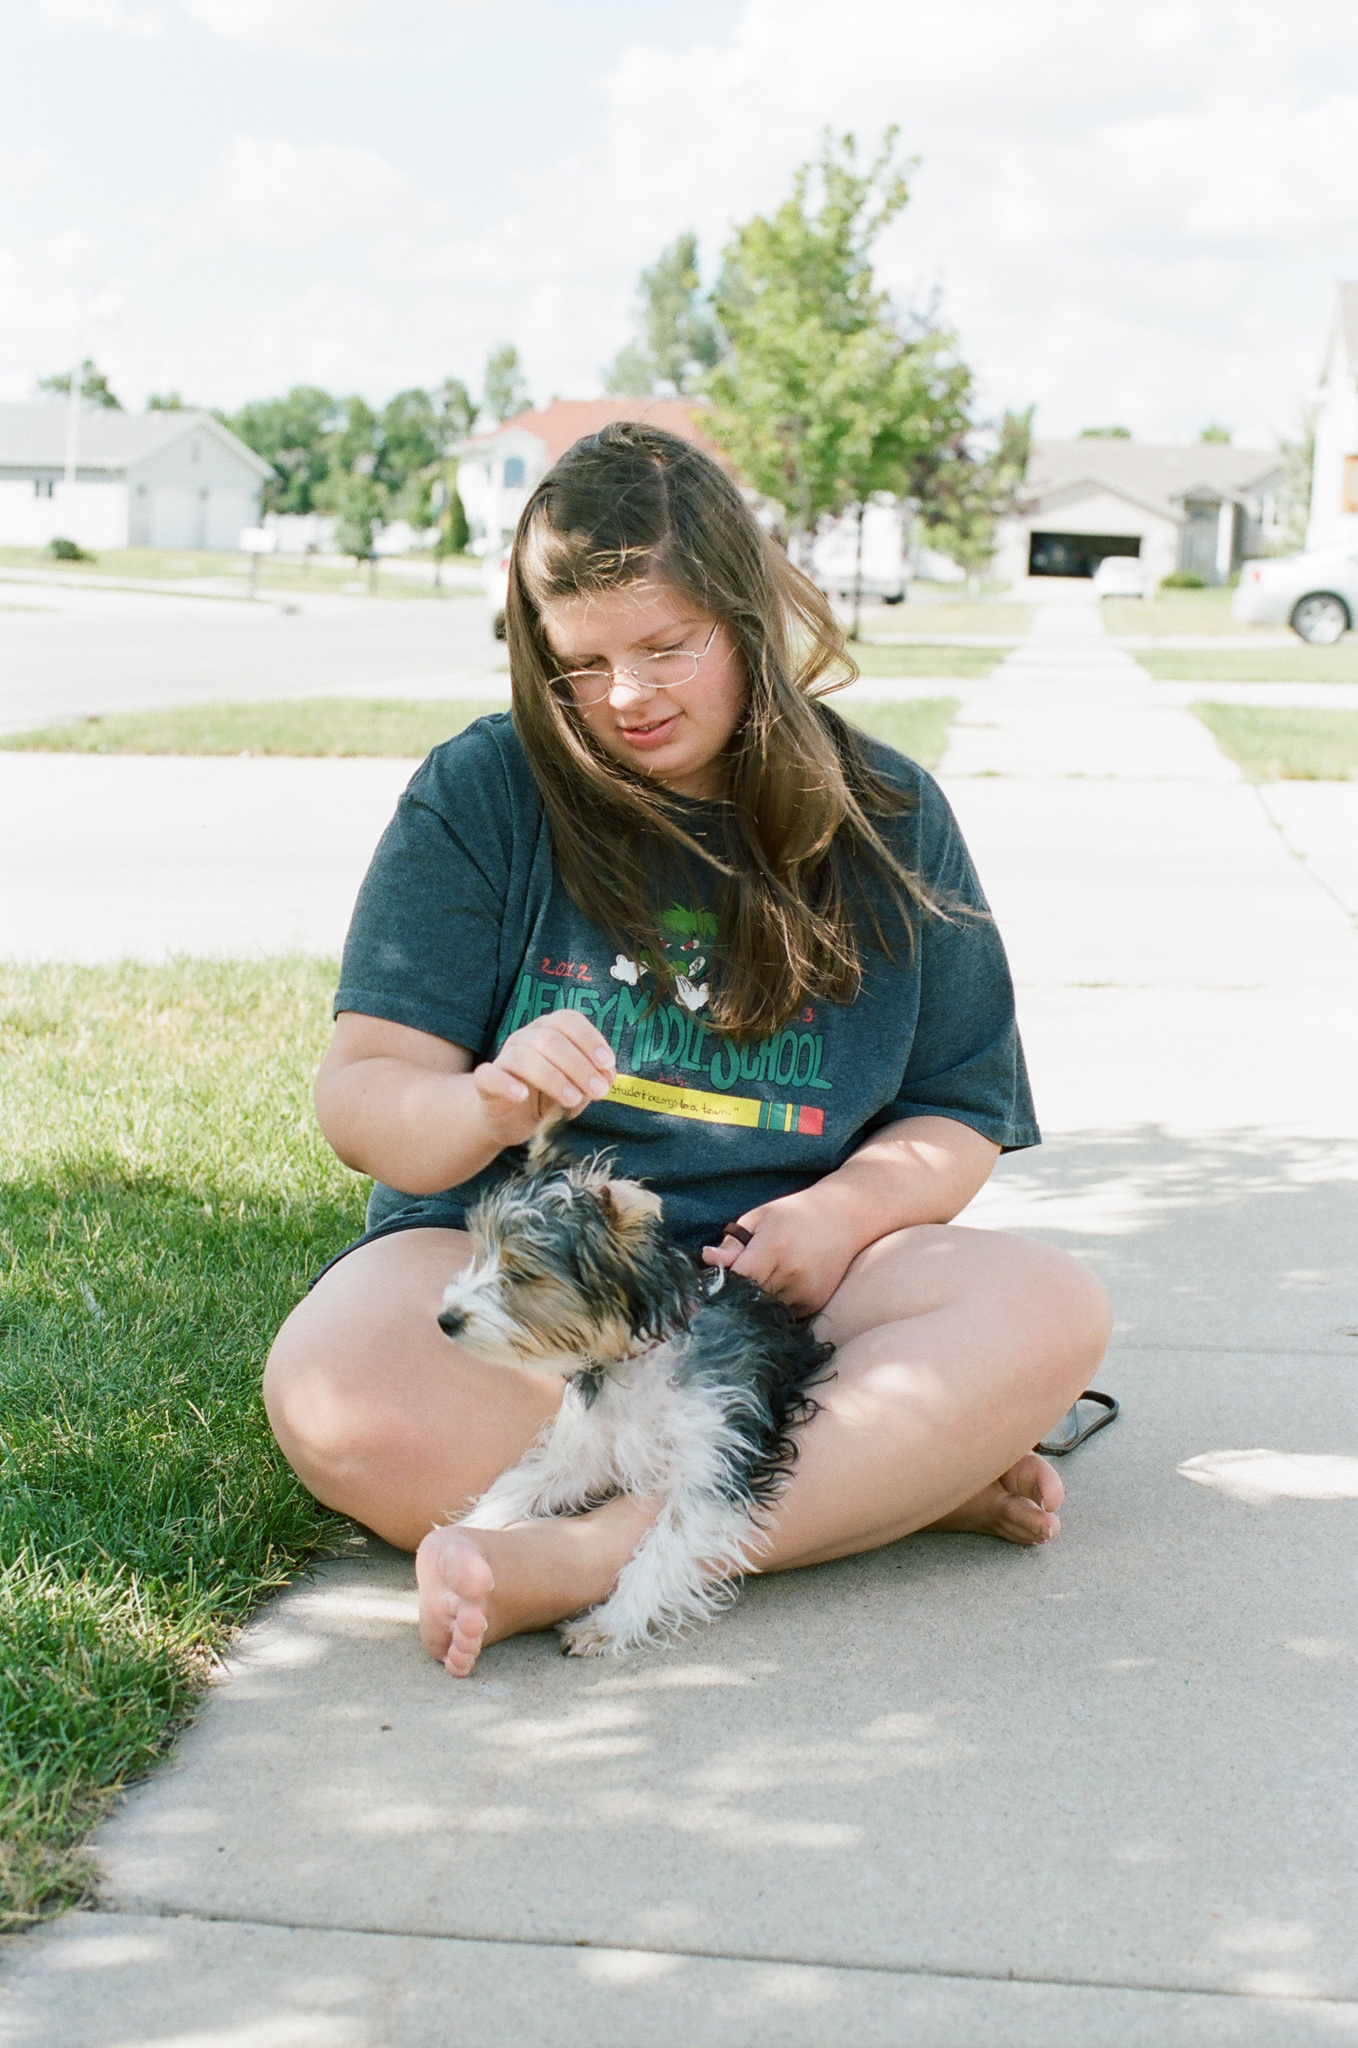 Teen and puppy on sidewalk